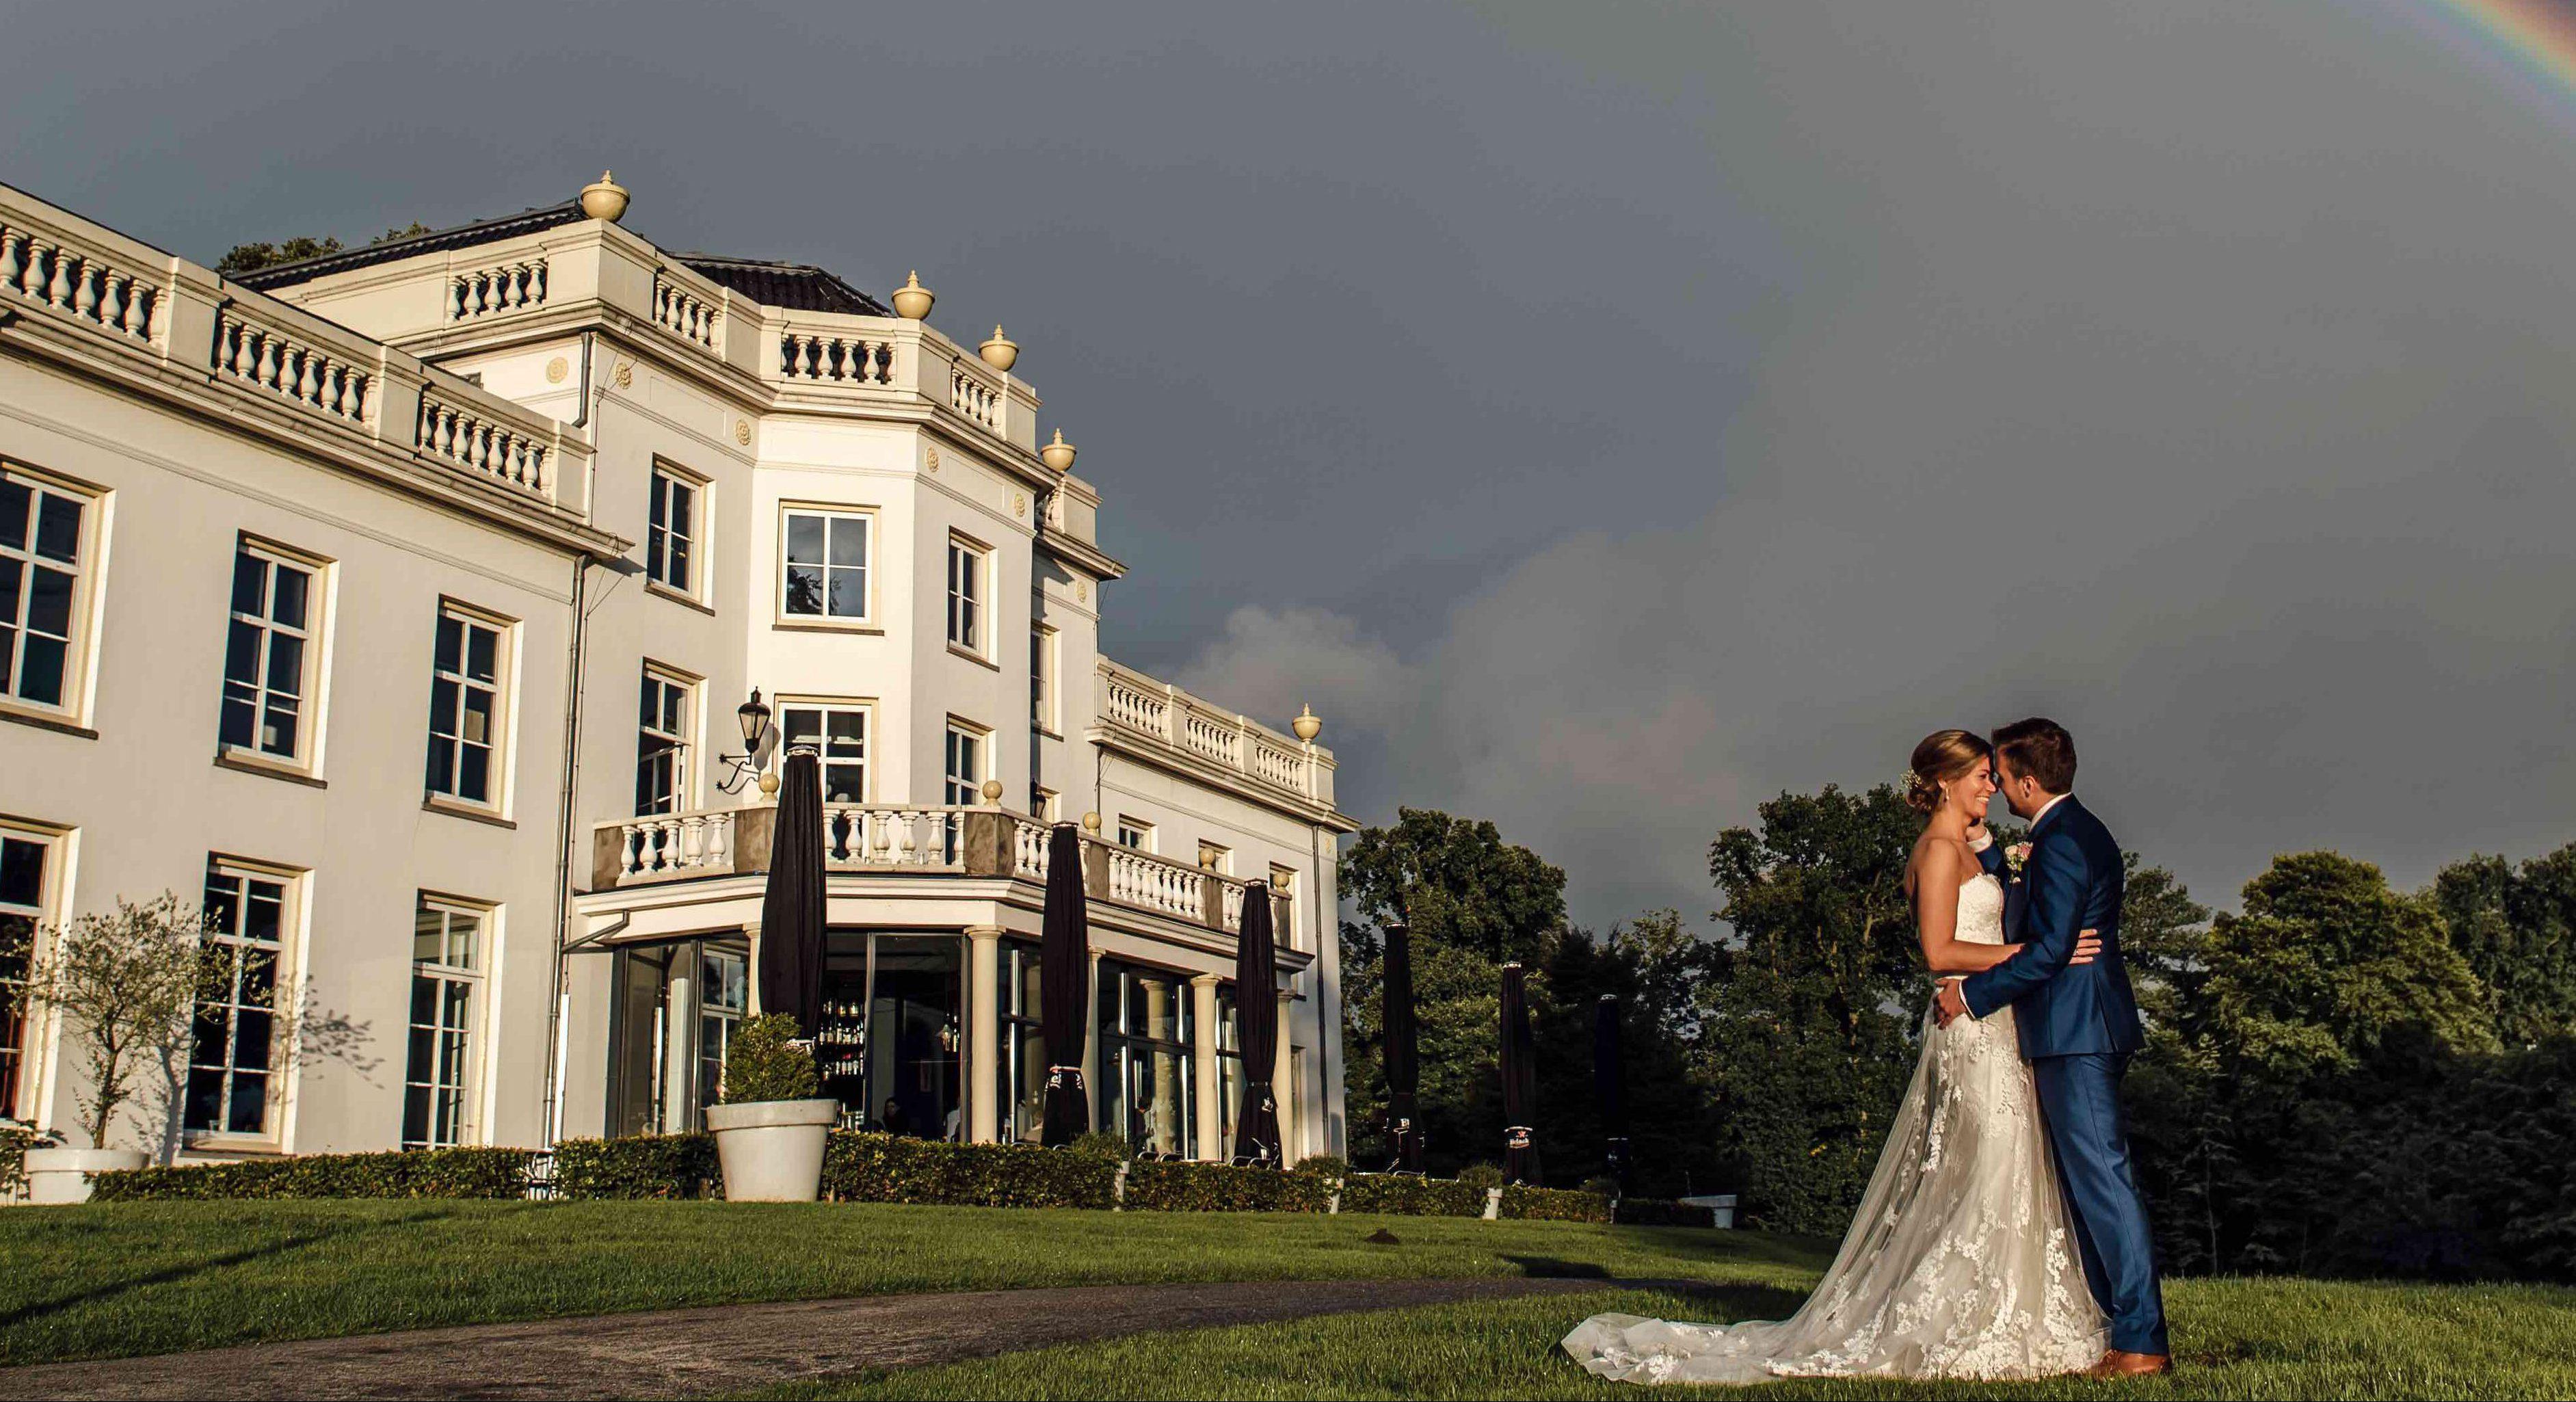 Trouwen in Stadsvilla Sonsbeek in Arnhem bruiloft huwelijk ceremonie trouwlocatie